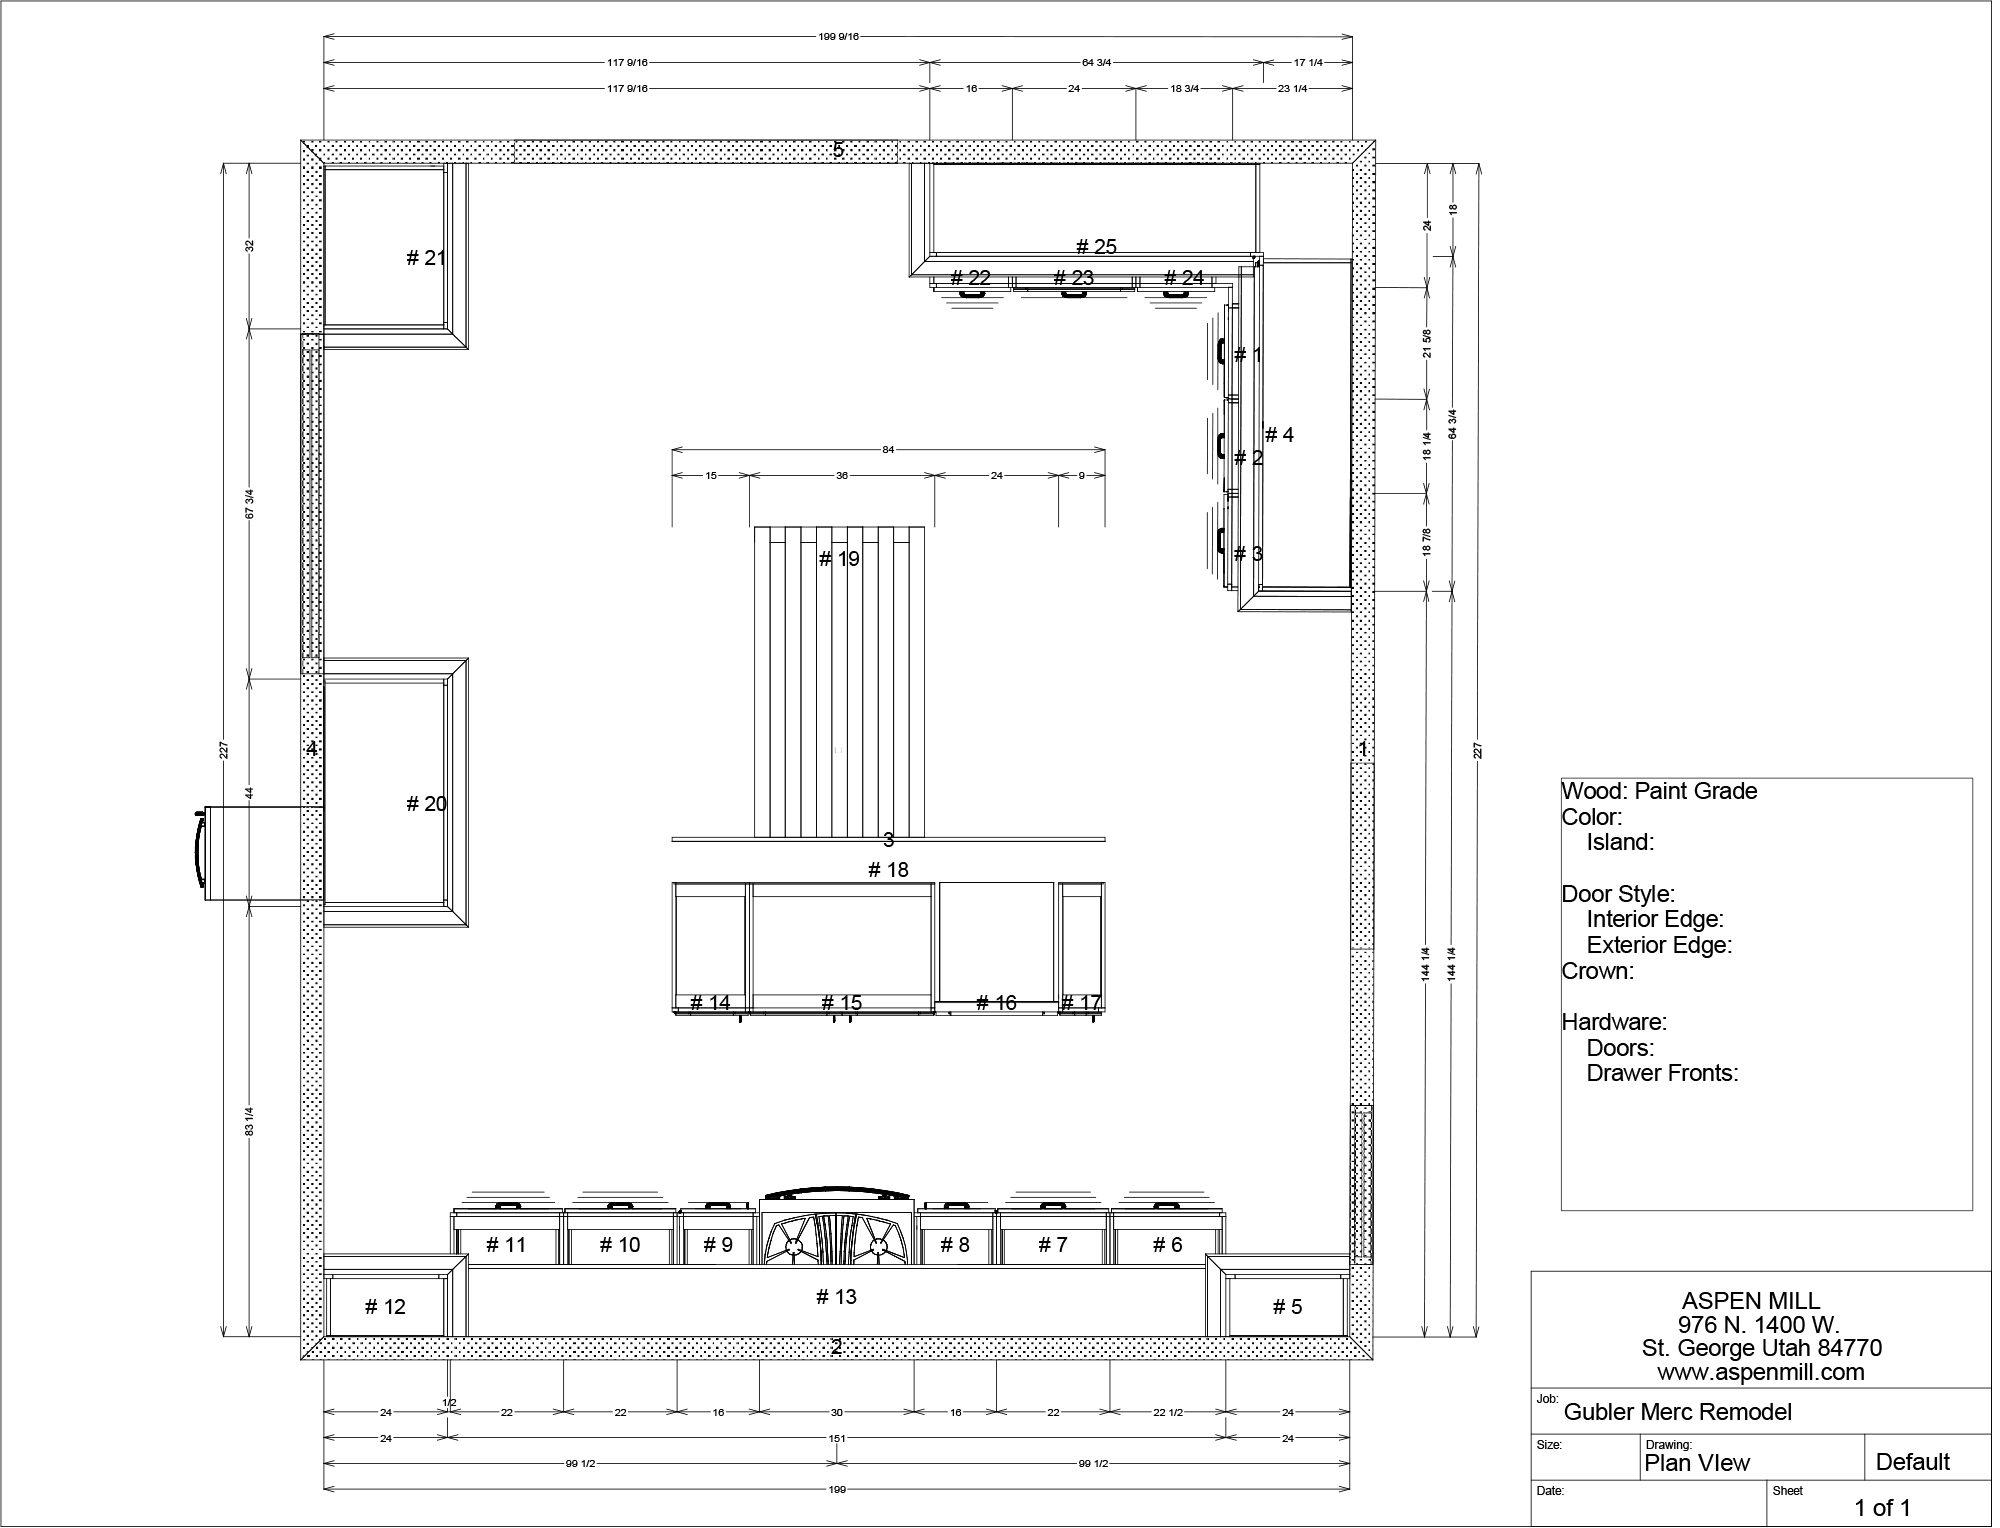 Kitchen Layout Design At The Merc Vintage Revivals